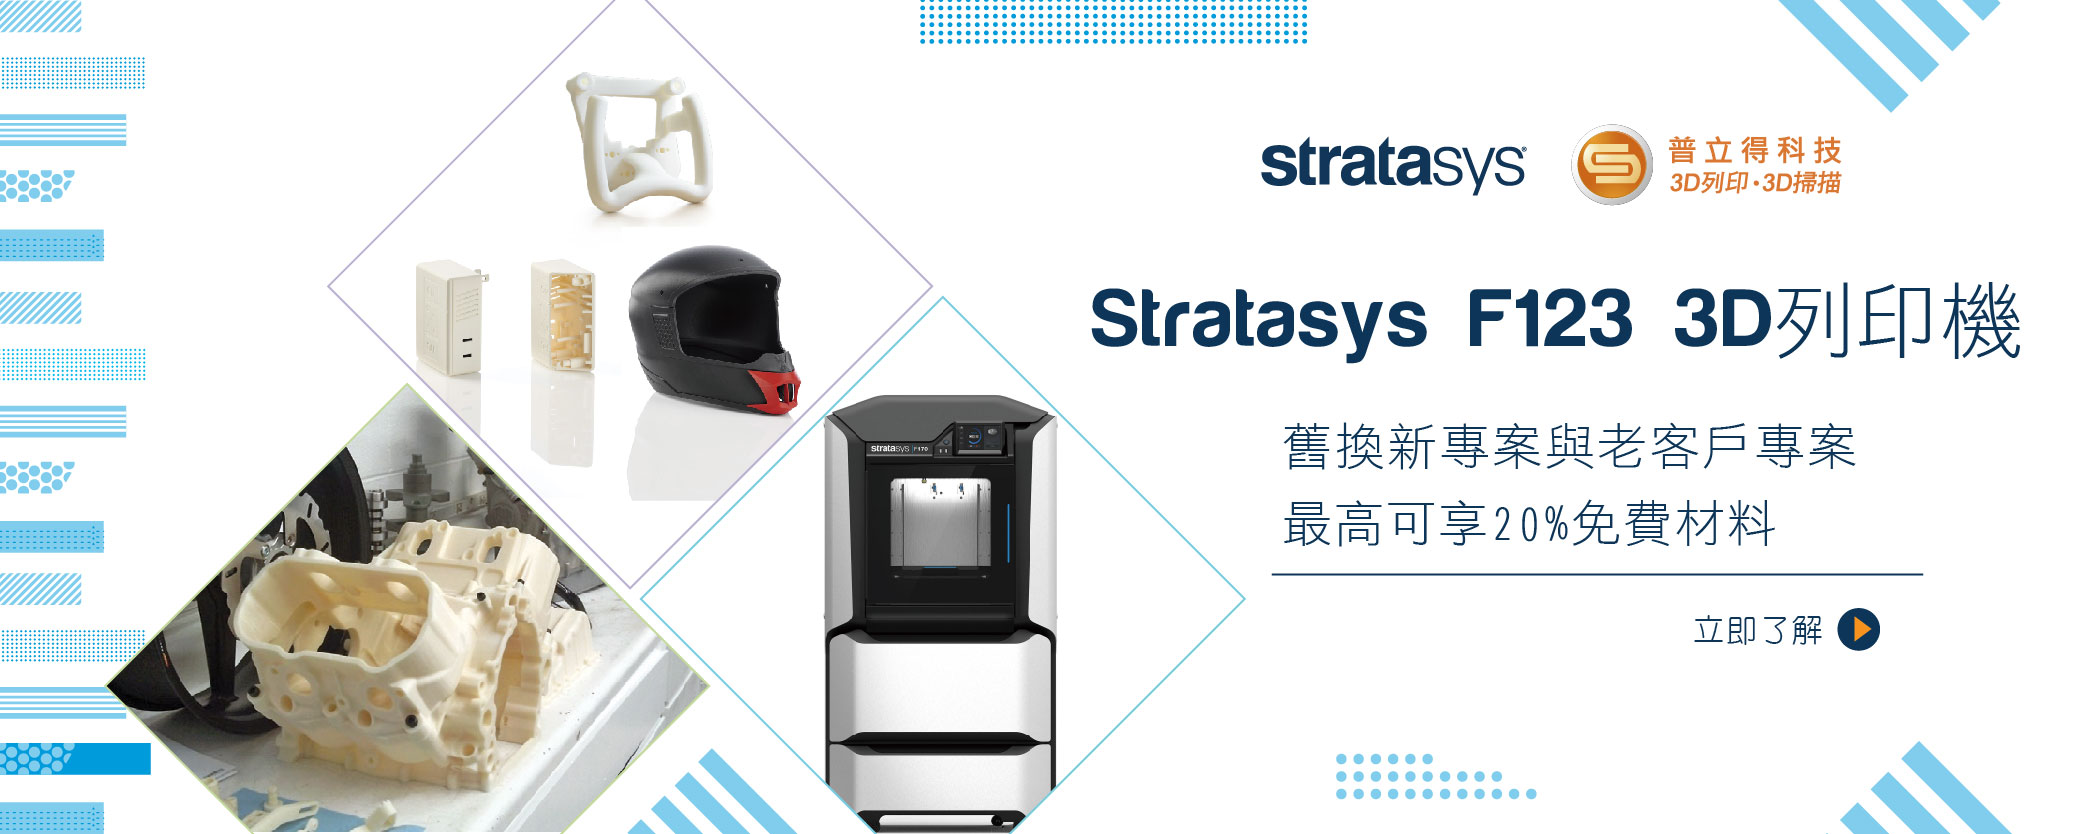 Stratasys F123 3D列印機